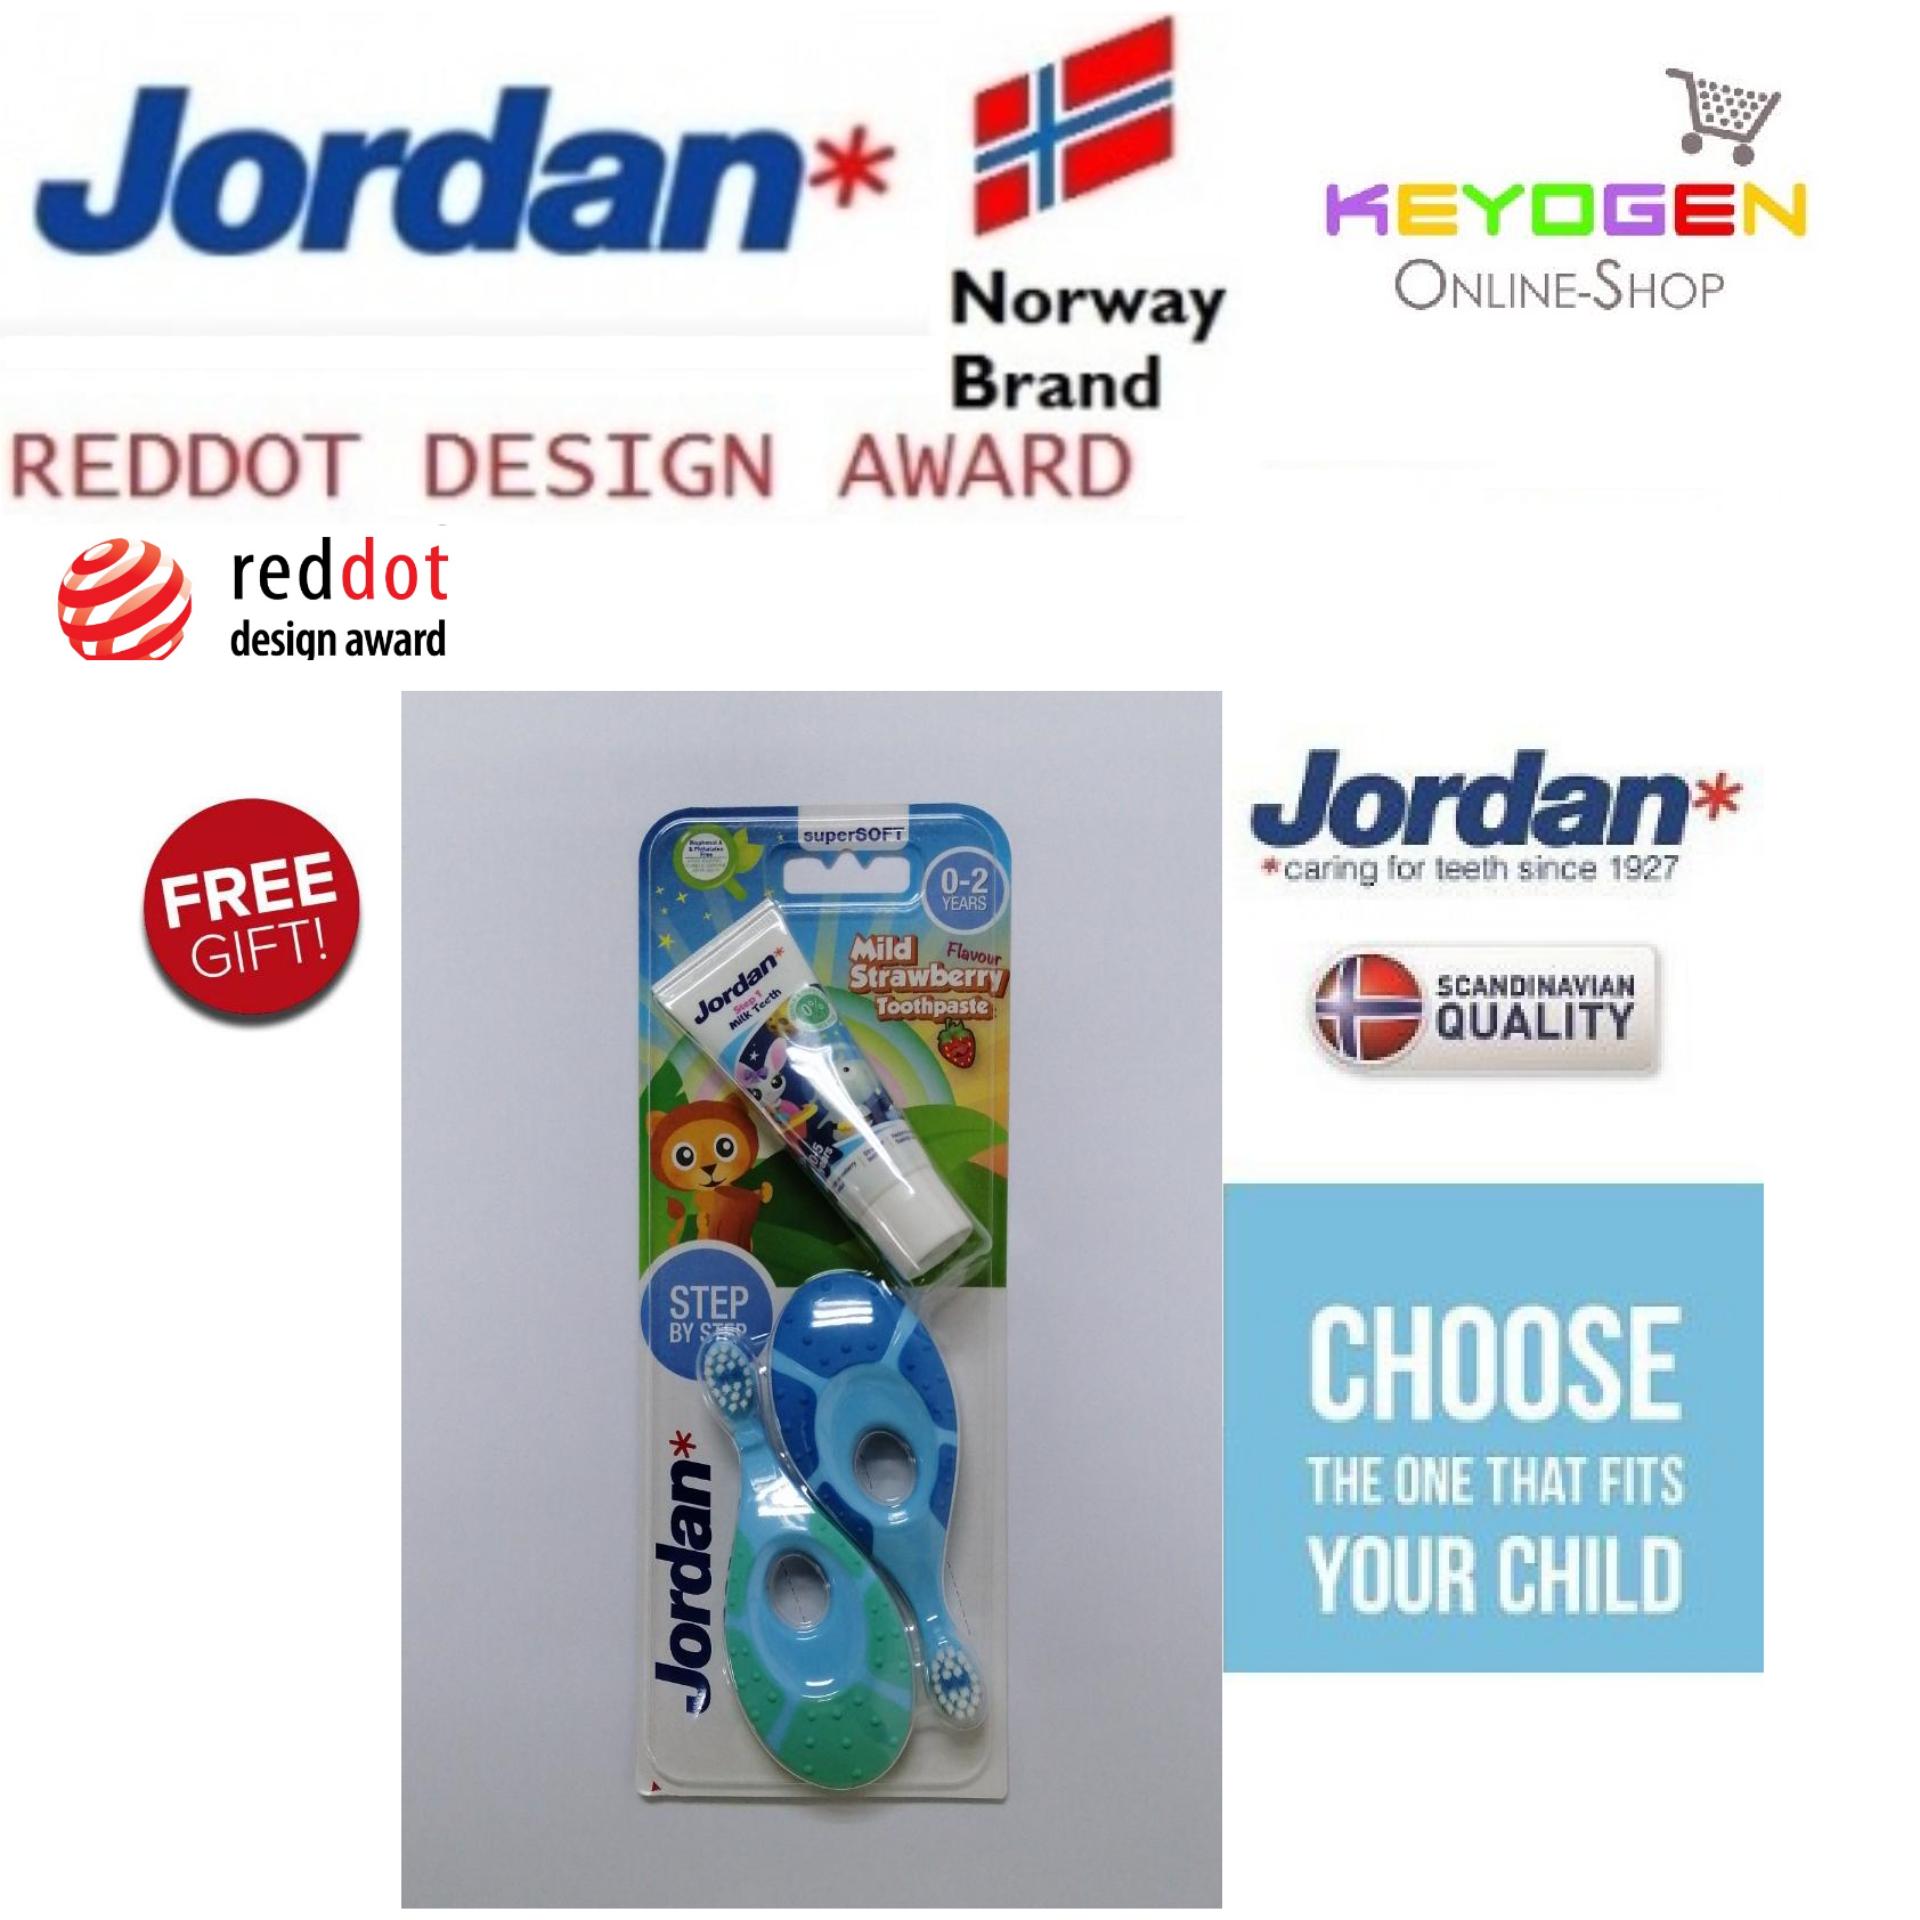 ( Norway brand ) 2 pieces Jordan Step 1 Baby soft Toothbrush 0-2 Years BPA Free - REDDOT DESIGN AWARD ( random color deal ) [FREE Gift]